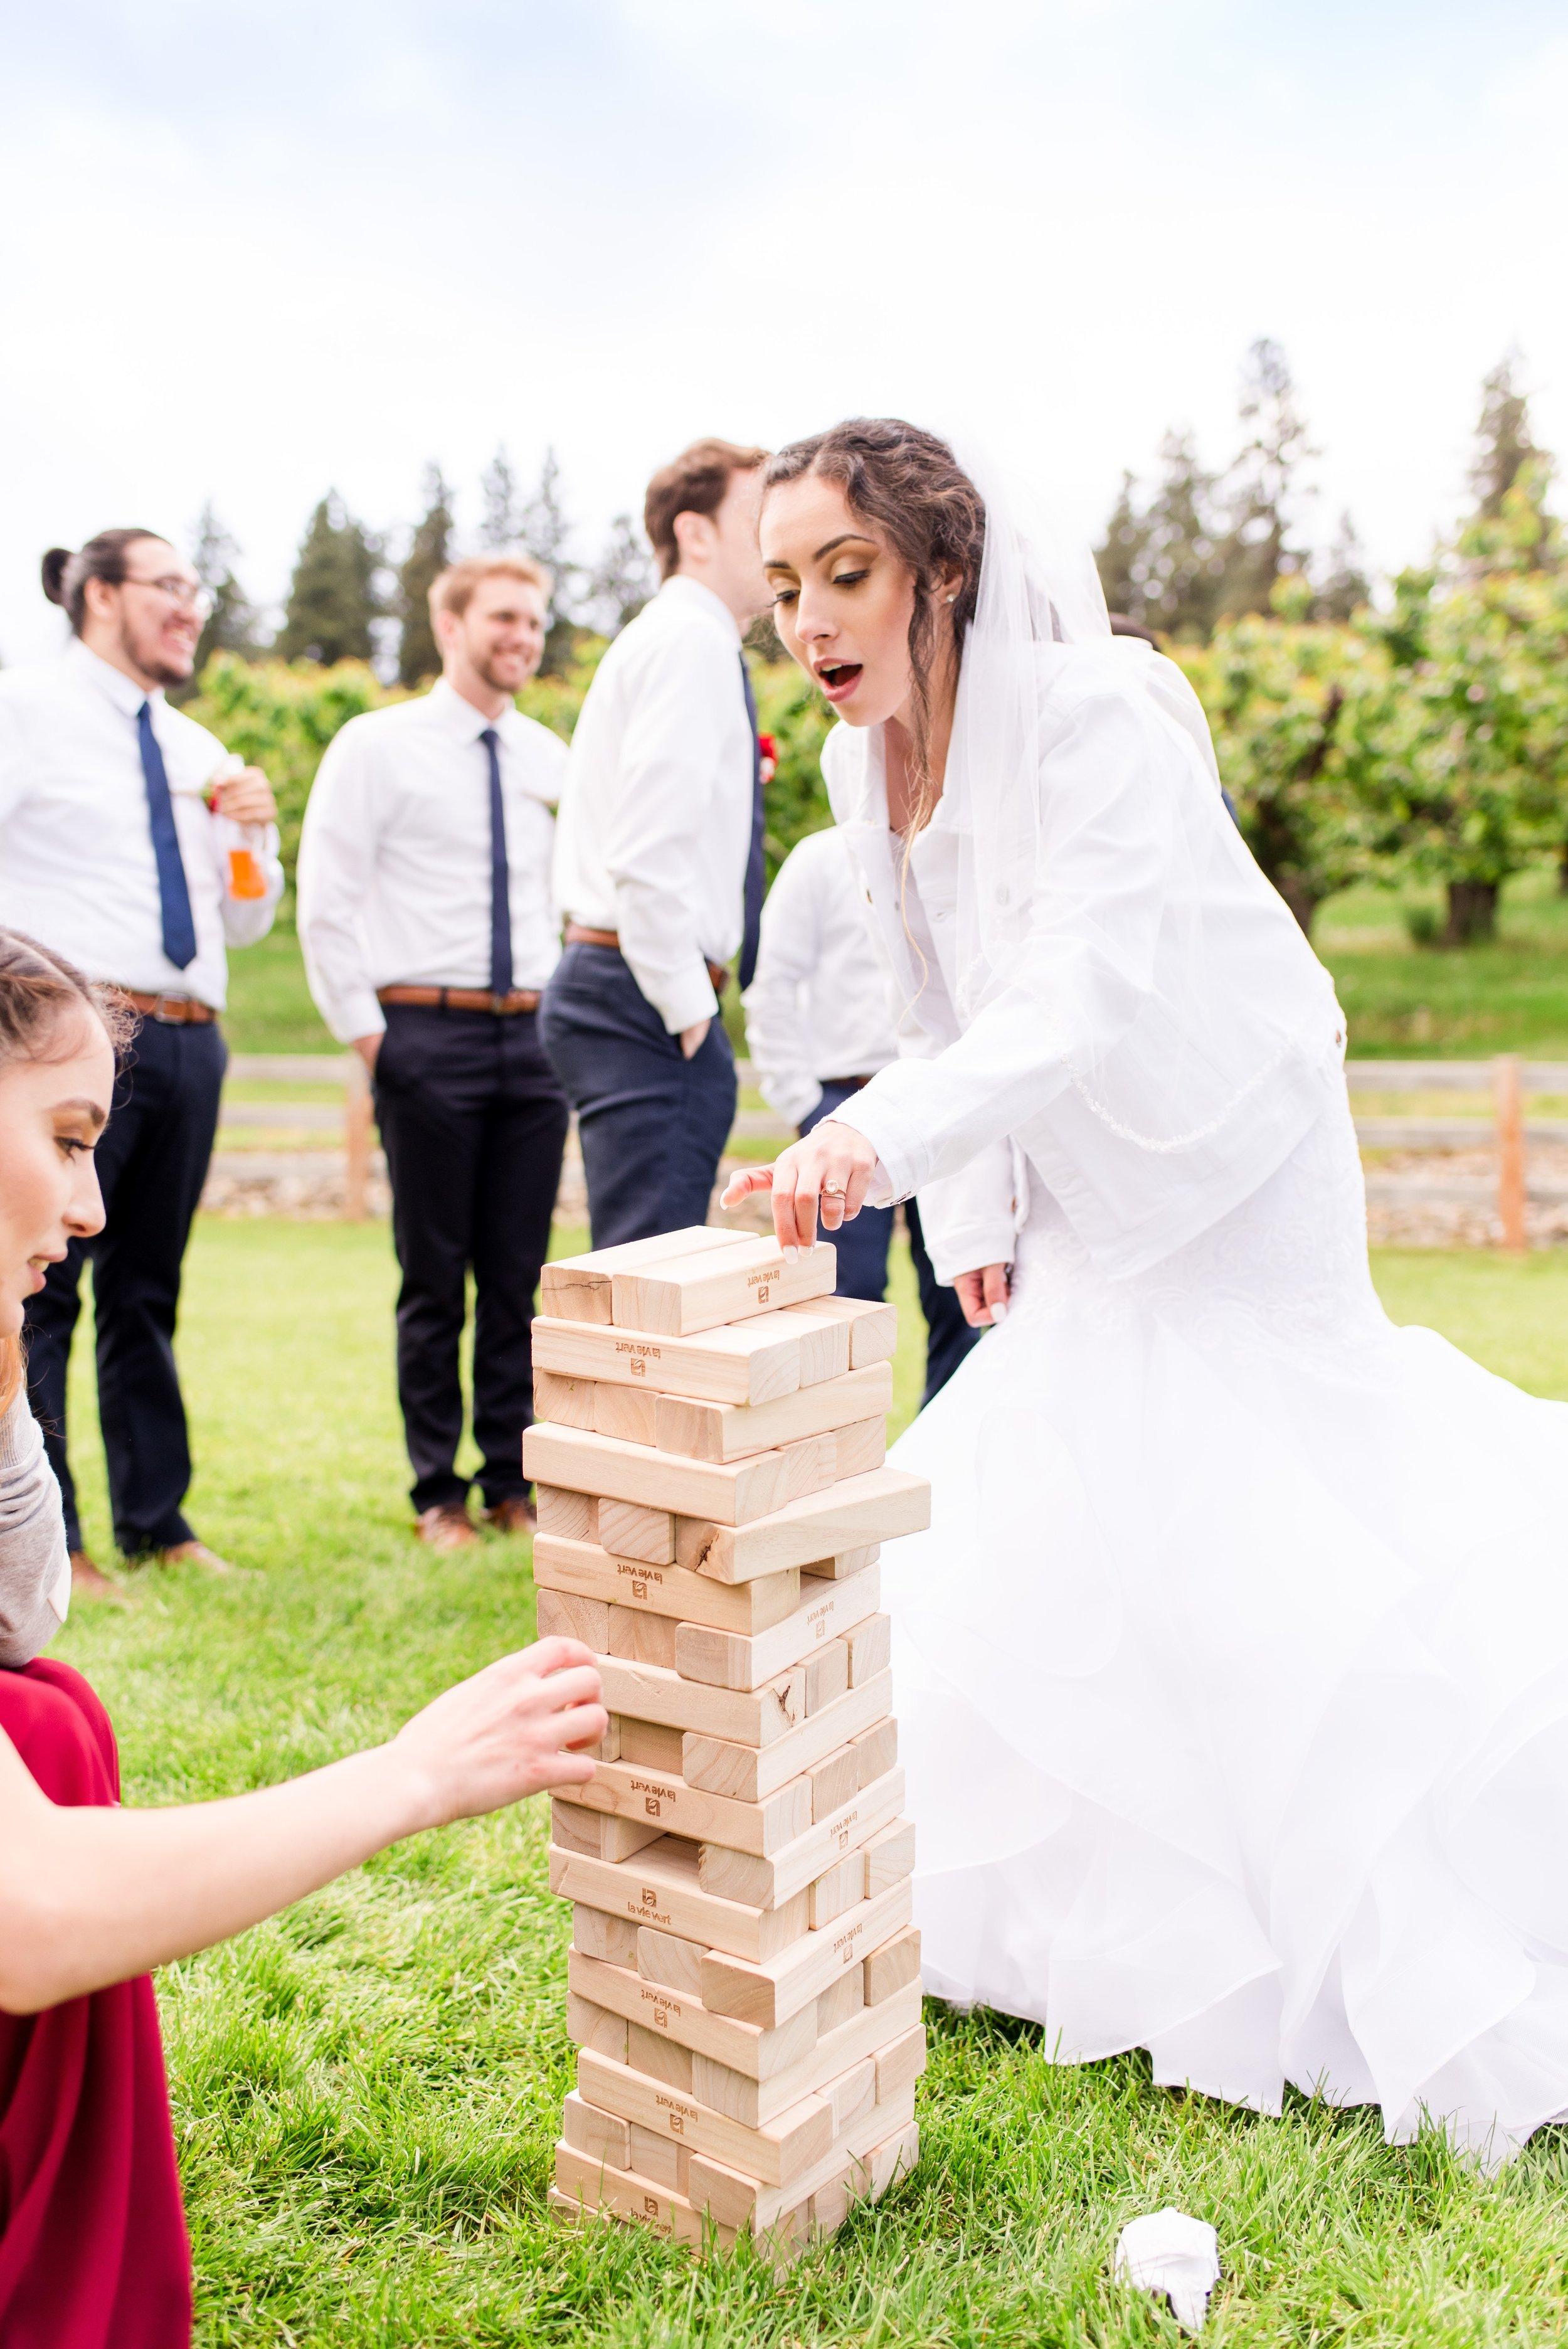 Wedding Lawn Games - Wenatchee, Washington White Barn Wedding - Hampton Hideaway - Morgan Tayler Photo & Design - Wenatchee Wedding Photographer